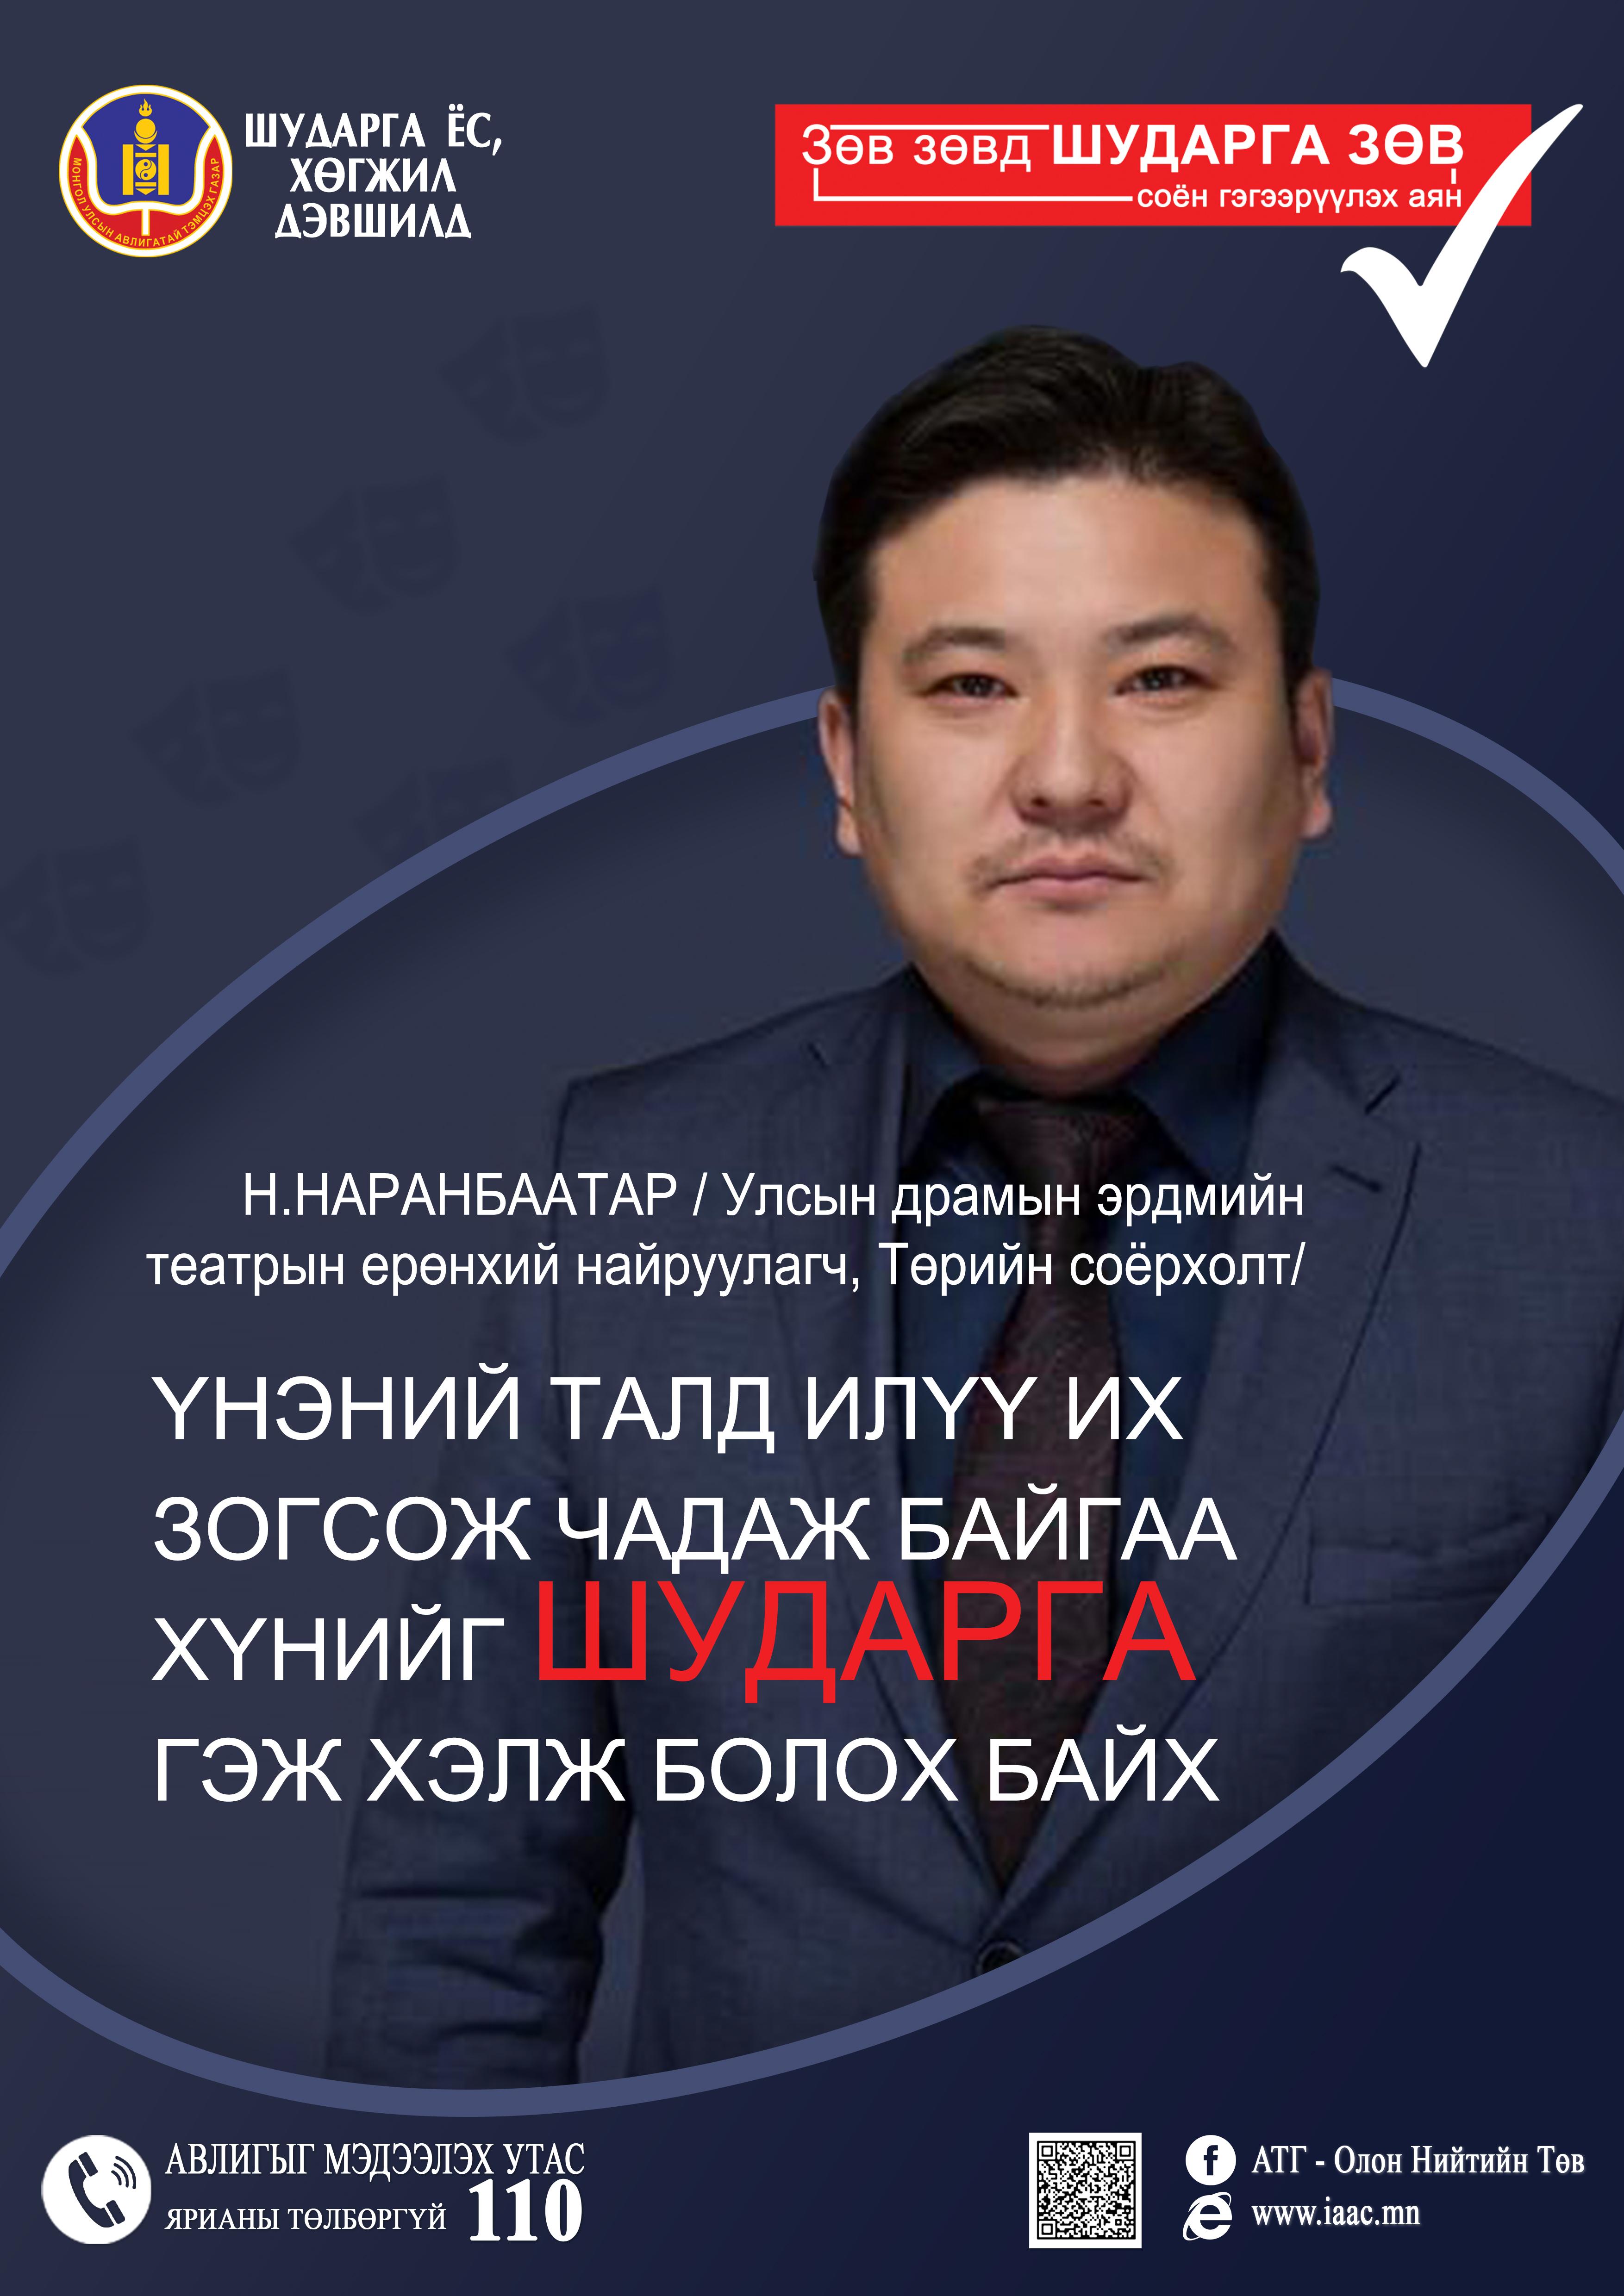 https://culture.gov.mn/media/209258366561663abdd5919.jpg